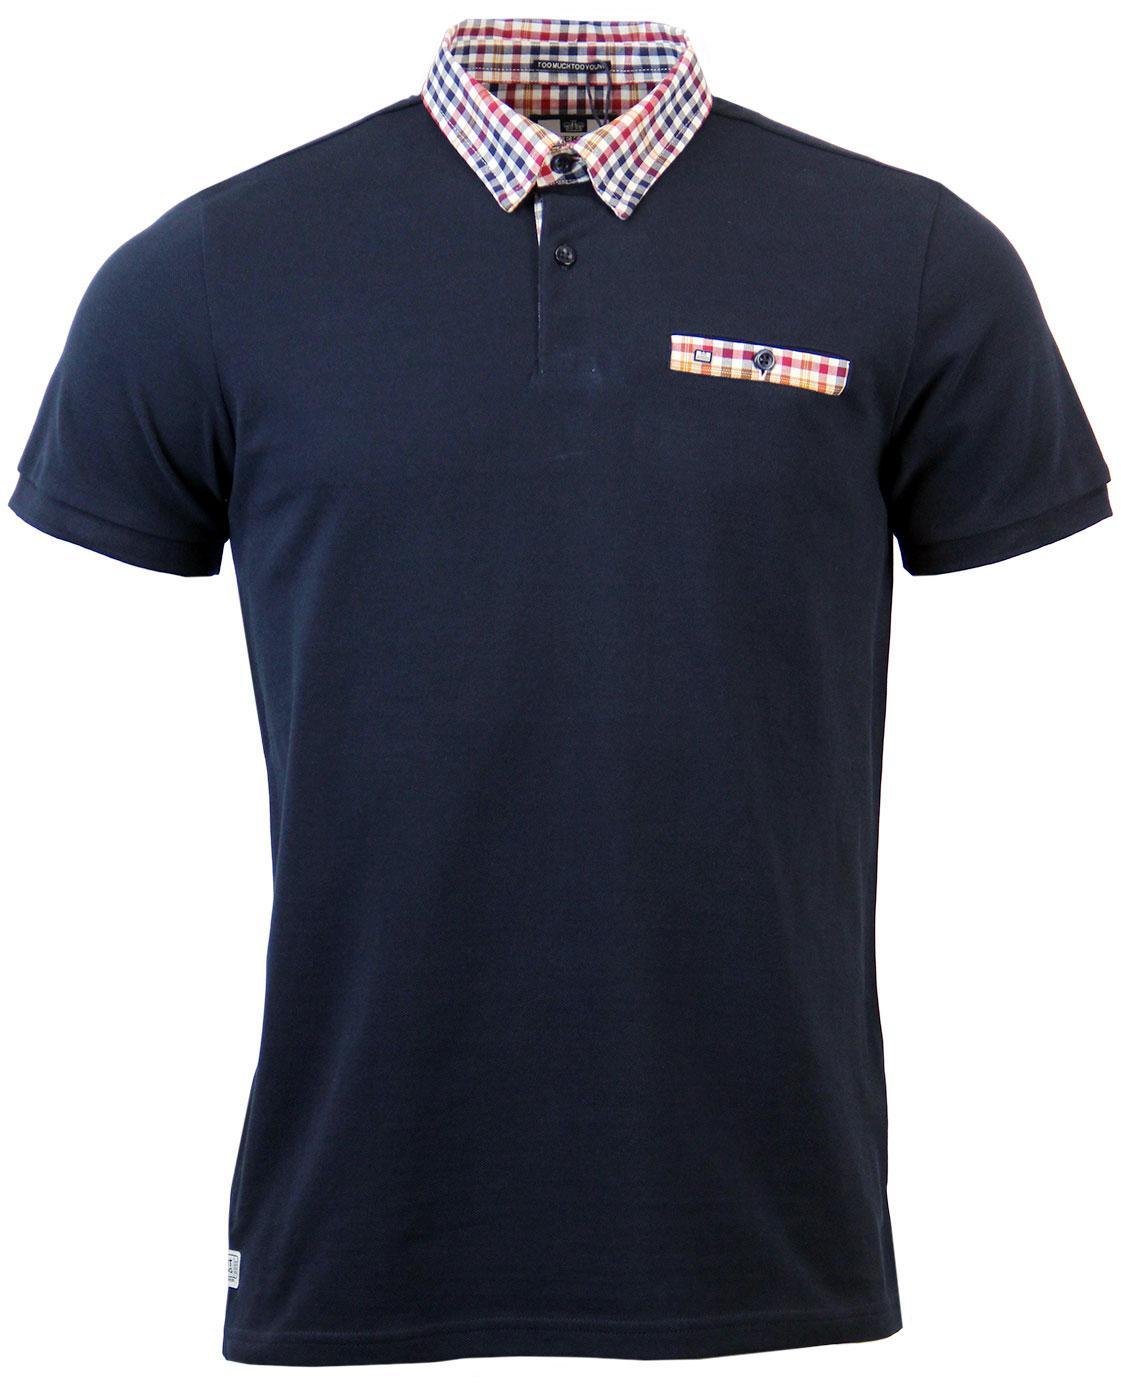 Baron WEEKEND OFFENDER Mod Shirting Collar Polo